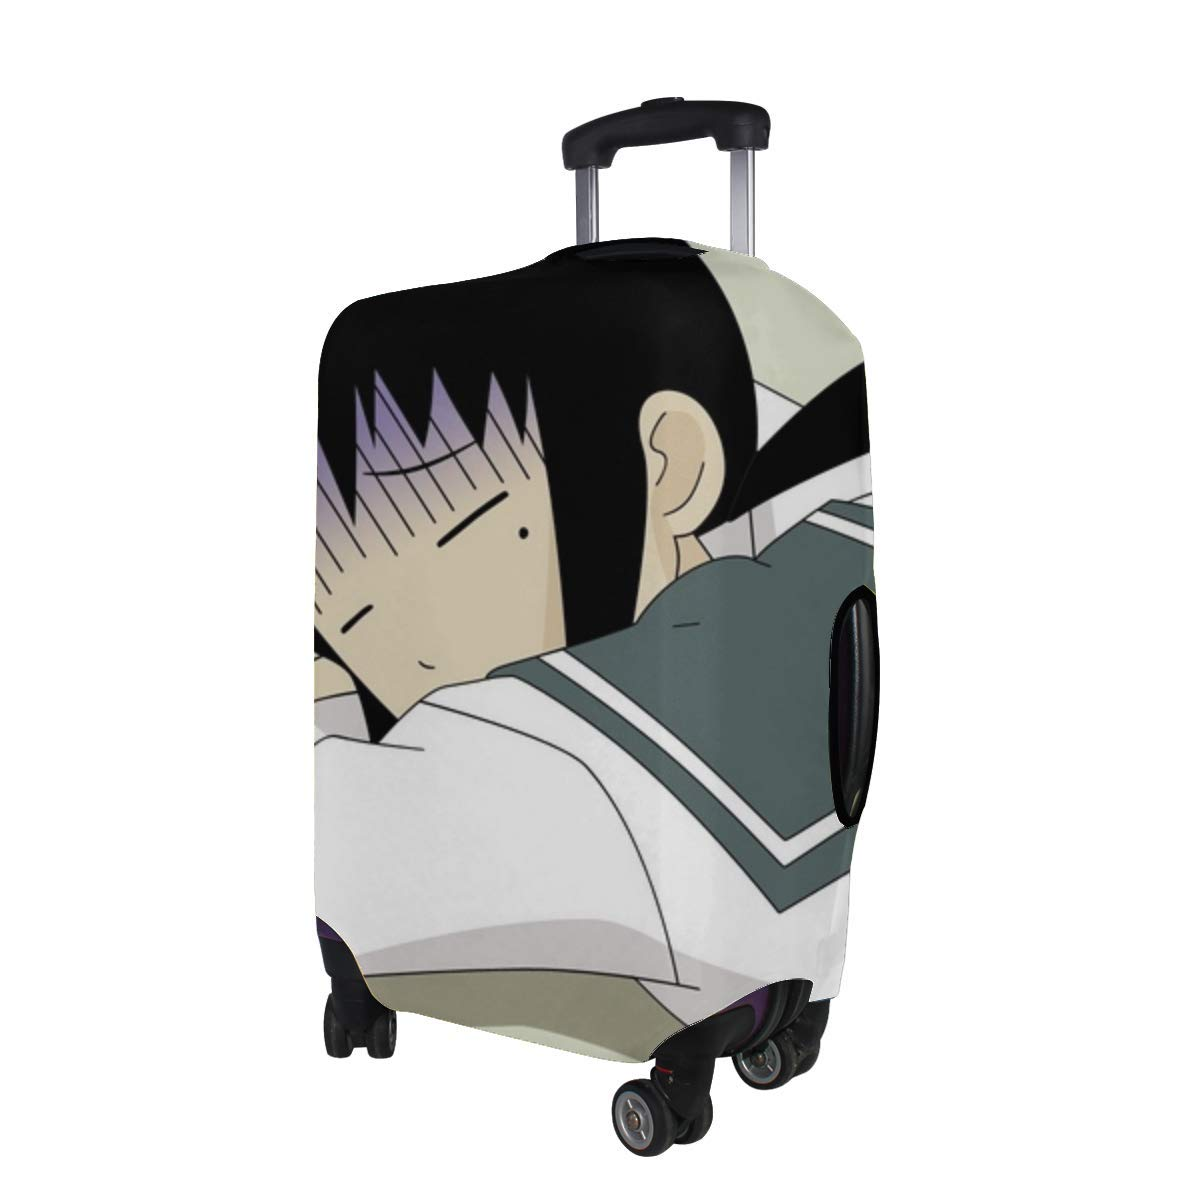 Maxm Sayonara Zetsubou Sen Schoolgirl Sleeping Pattern Print Travel Luggage Protector Baggage Suitcase Cover Fits 18-21 Inch Luggage